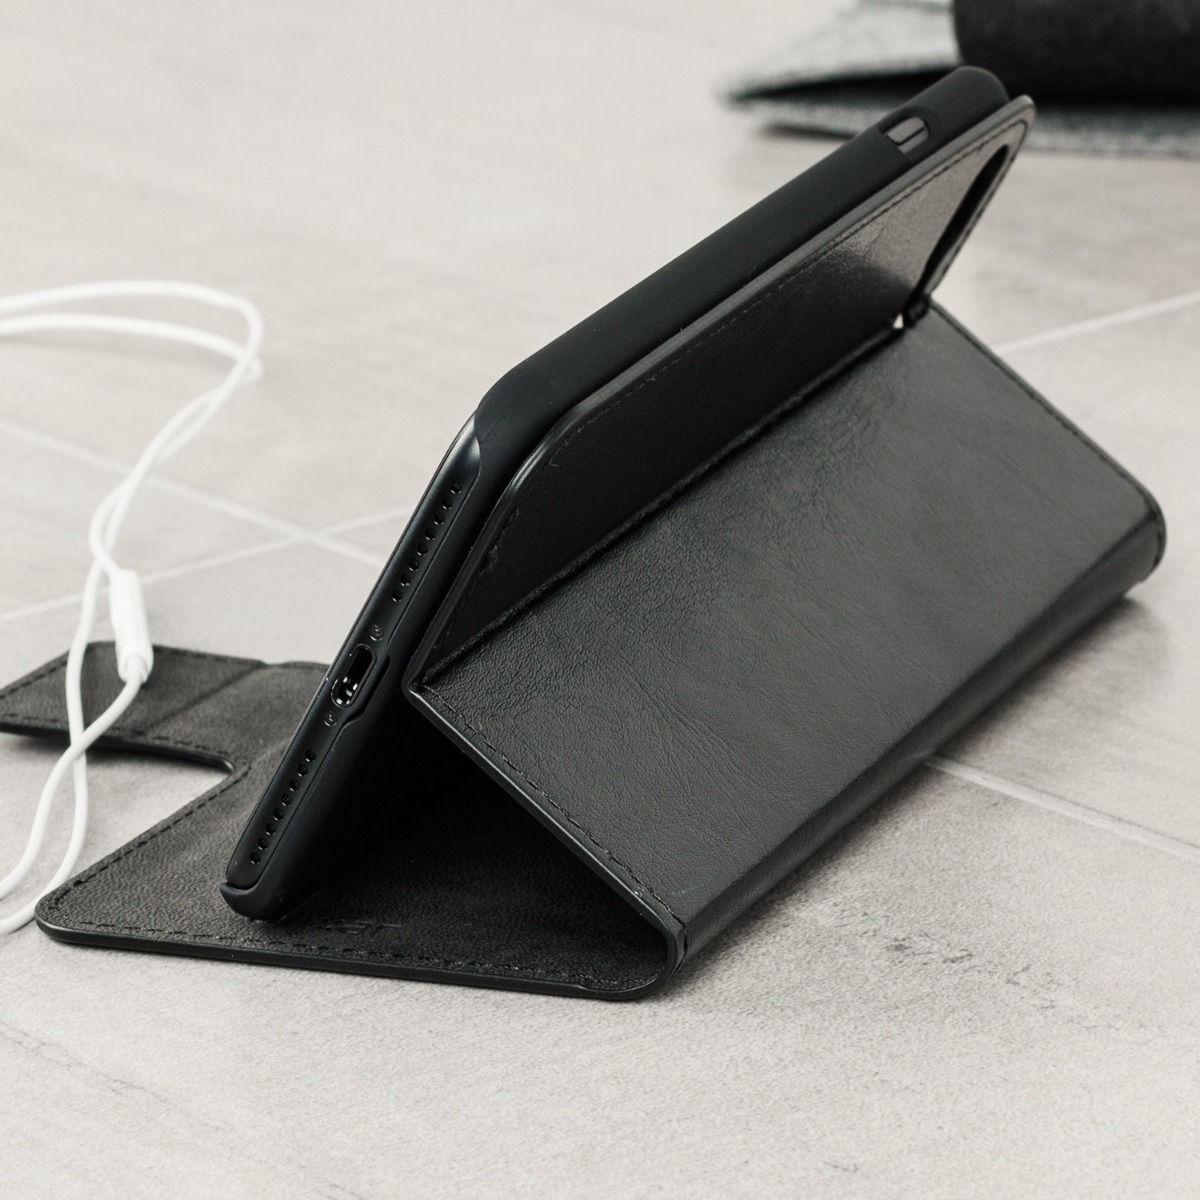 50c26b656c89 Best Samsung Galaxy A6 cases: Clear, Rugged, Leather, Wallet, Slim ...